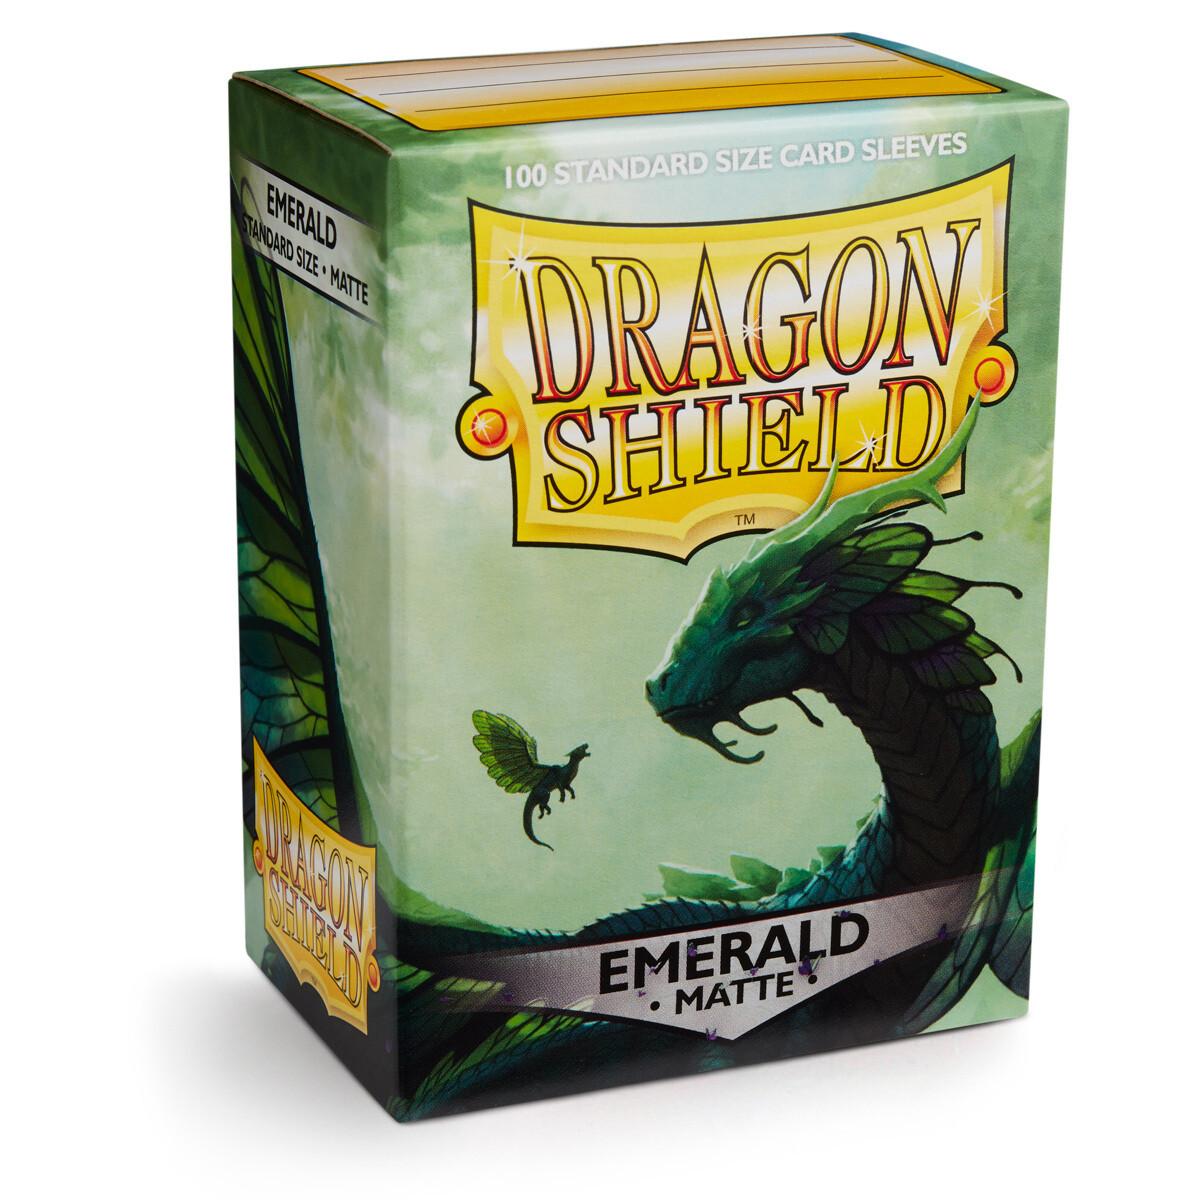 Dragon Shield 100 Sleeves - Matte Emerald